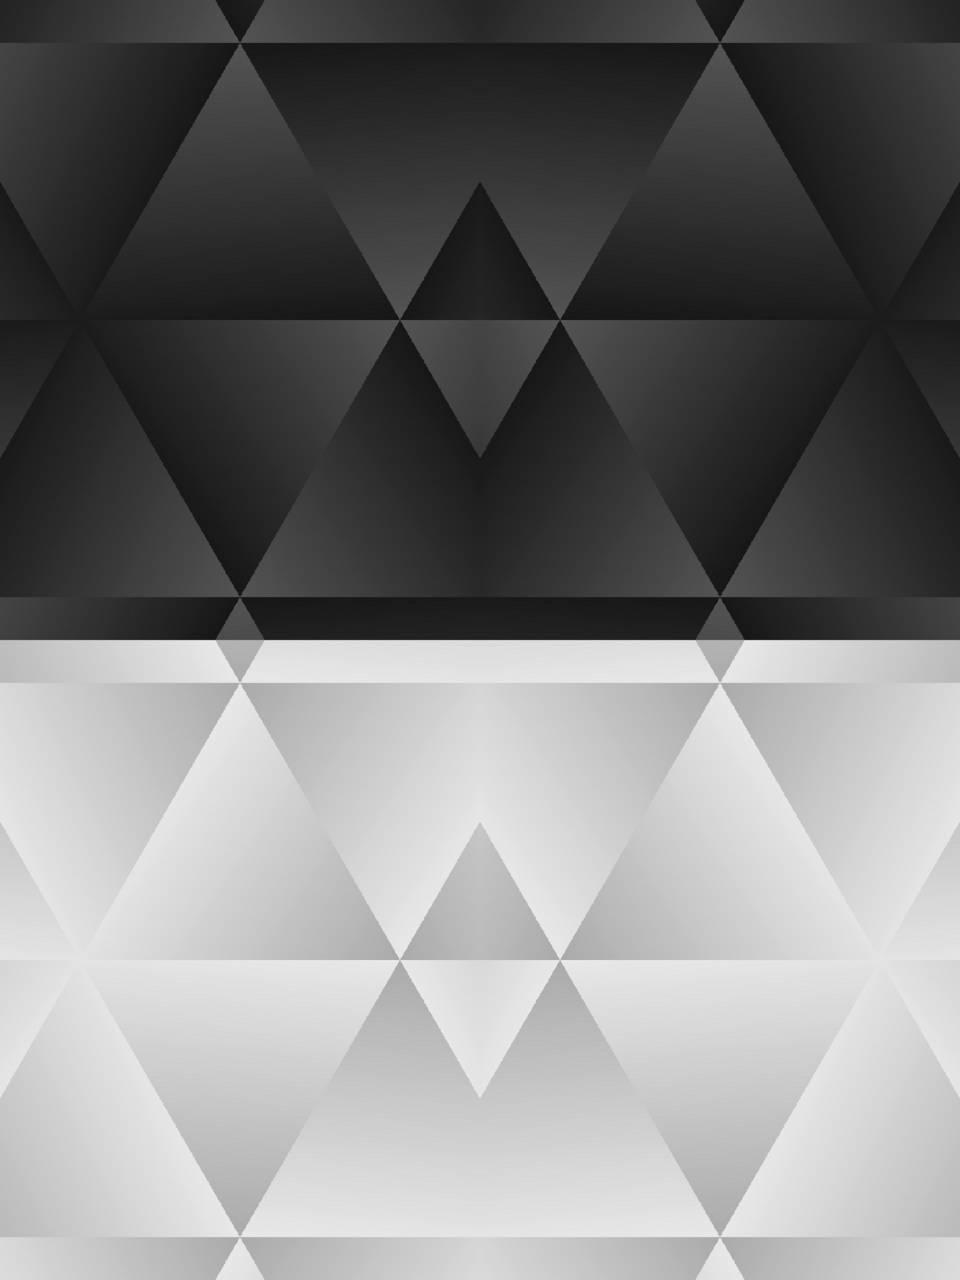 Contarst triangles